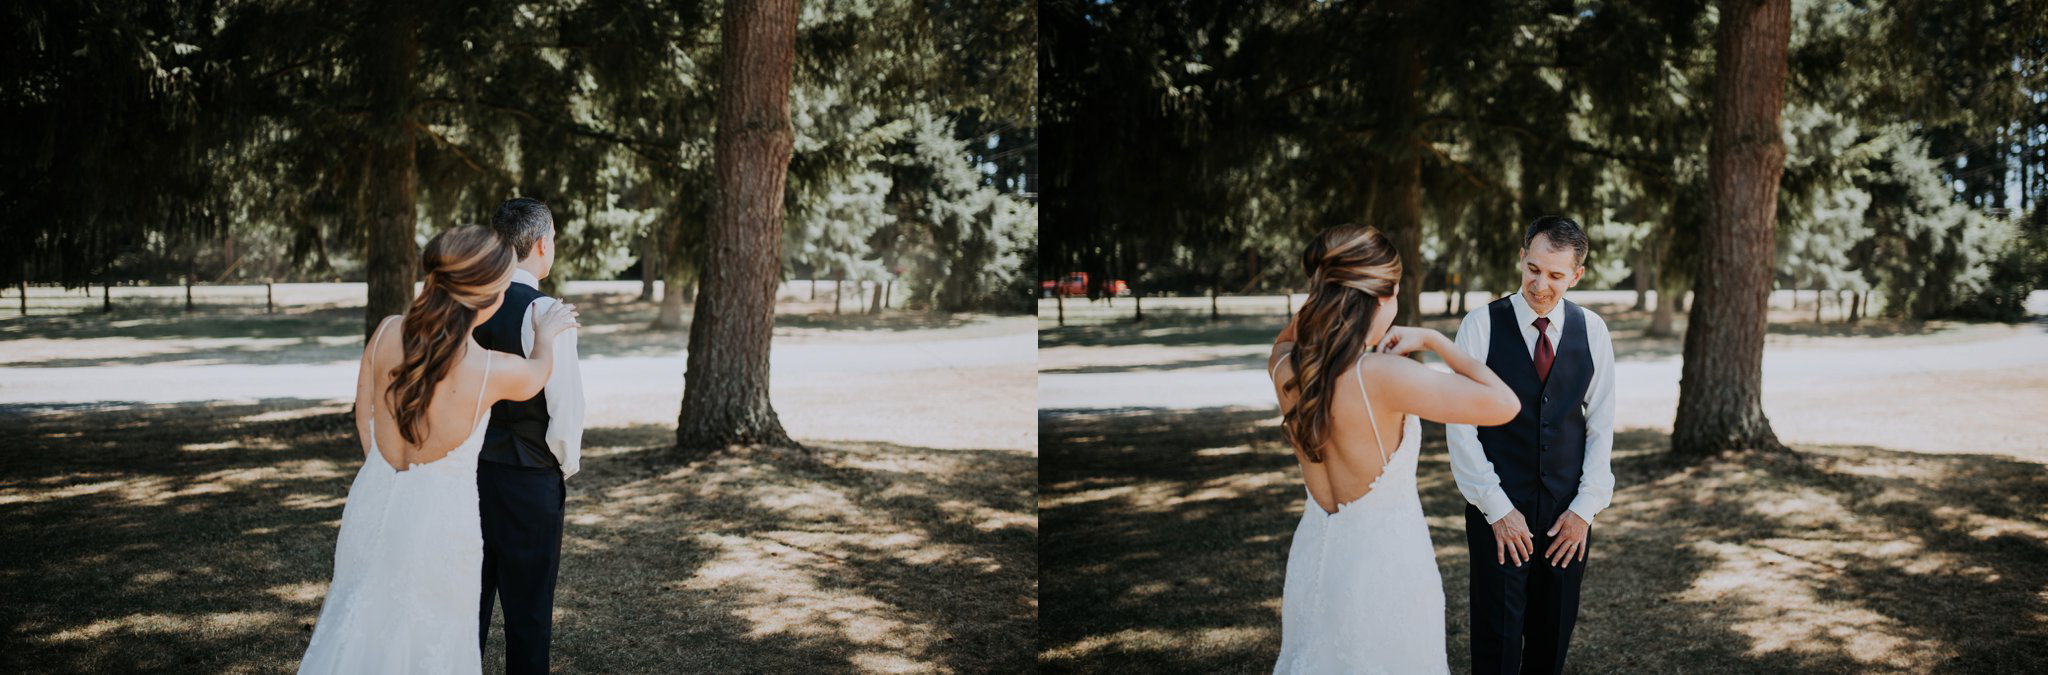 kristen-and-cody-the-kelley-farm-wedding-seattle-photographer-caitlyn-nikula-25.jpg